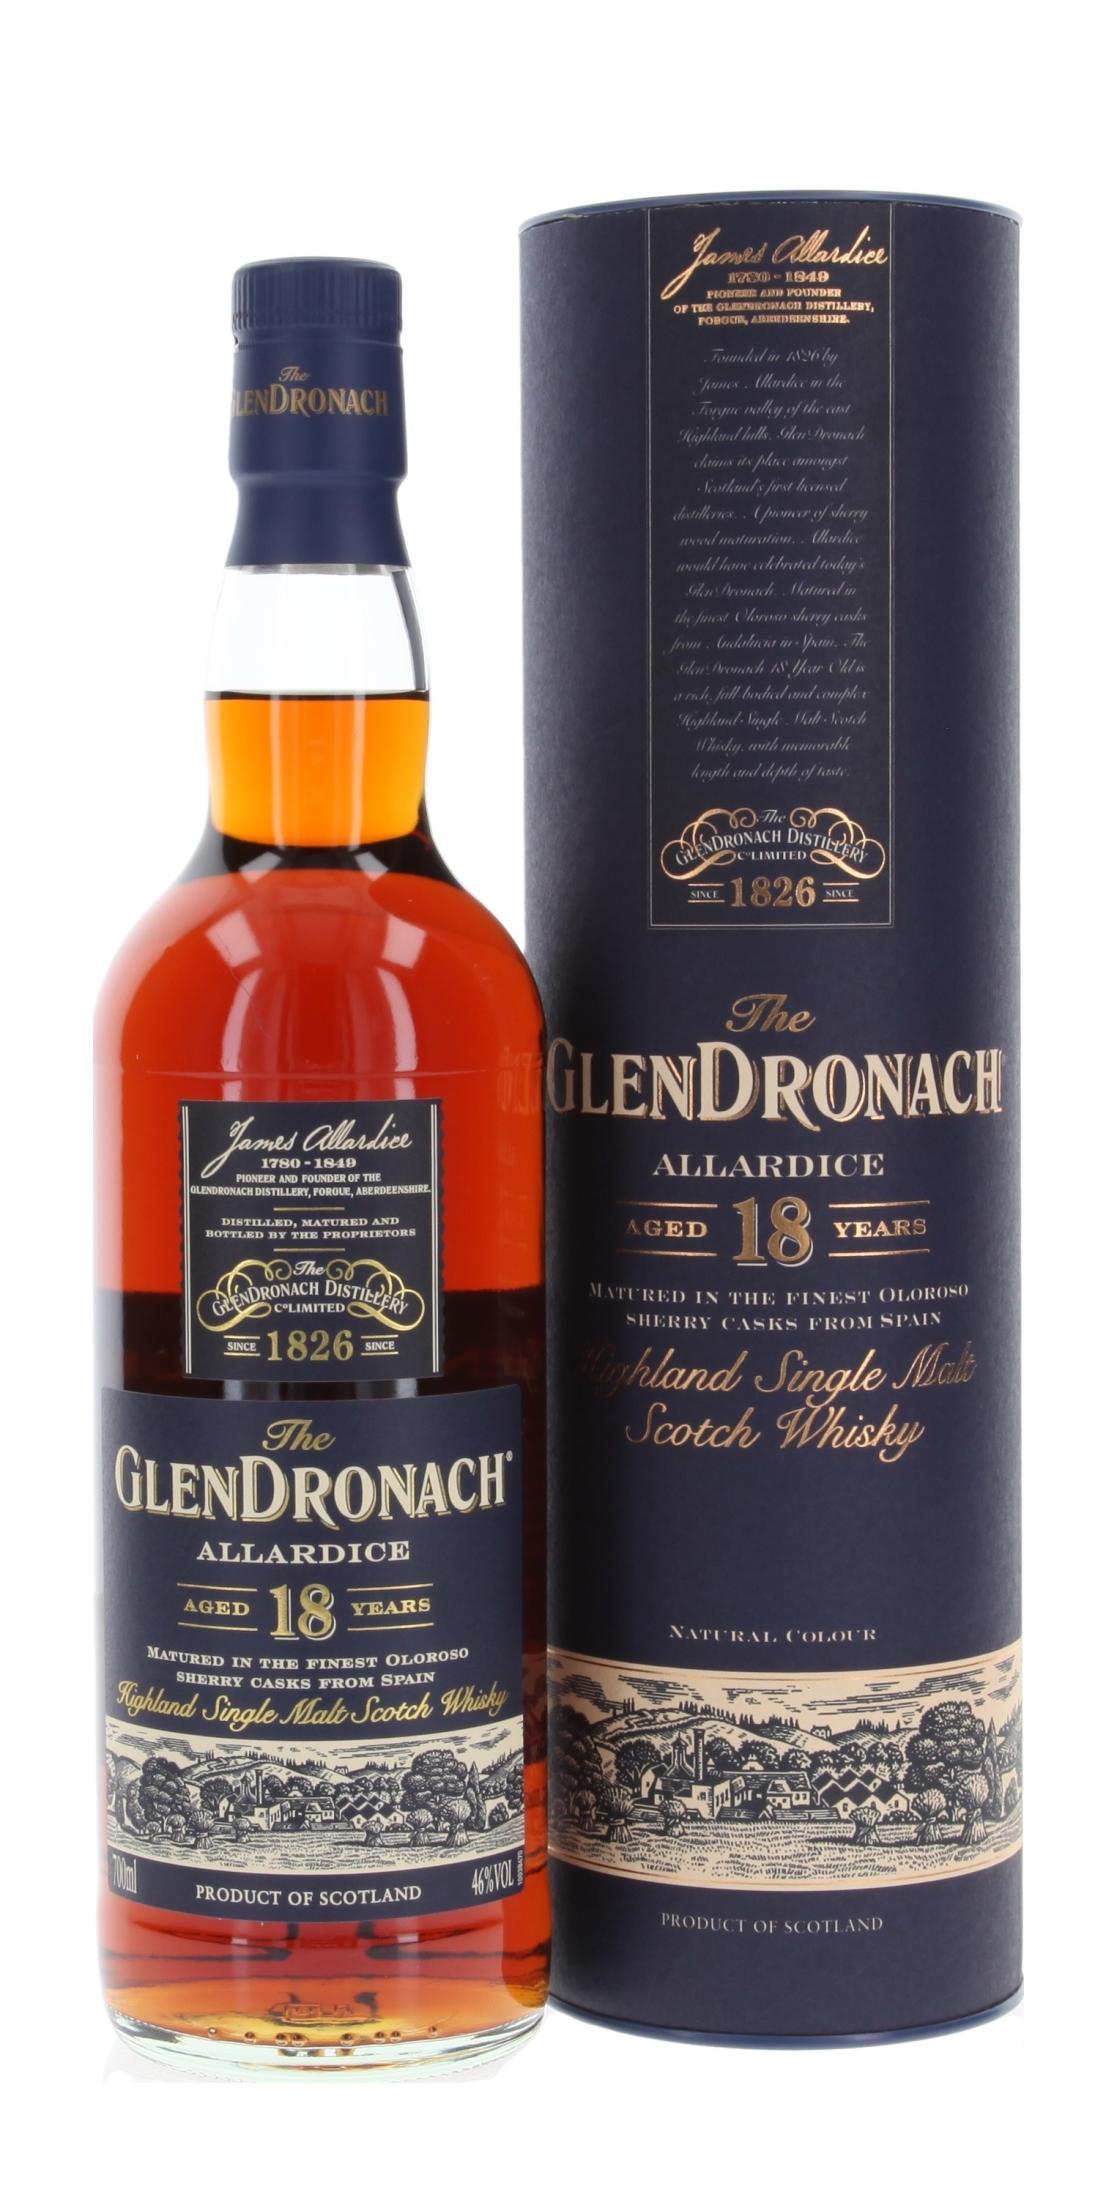 Glendronach Allardice